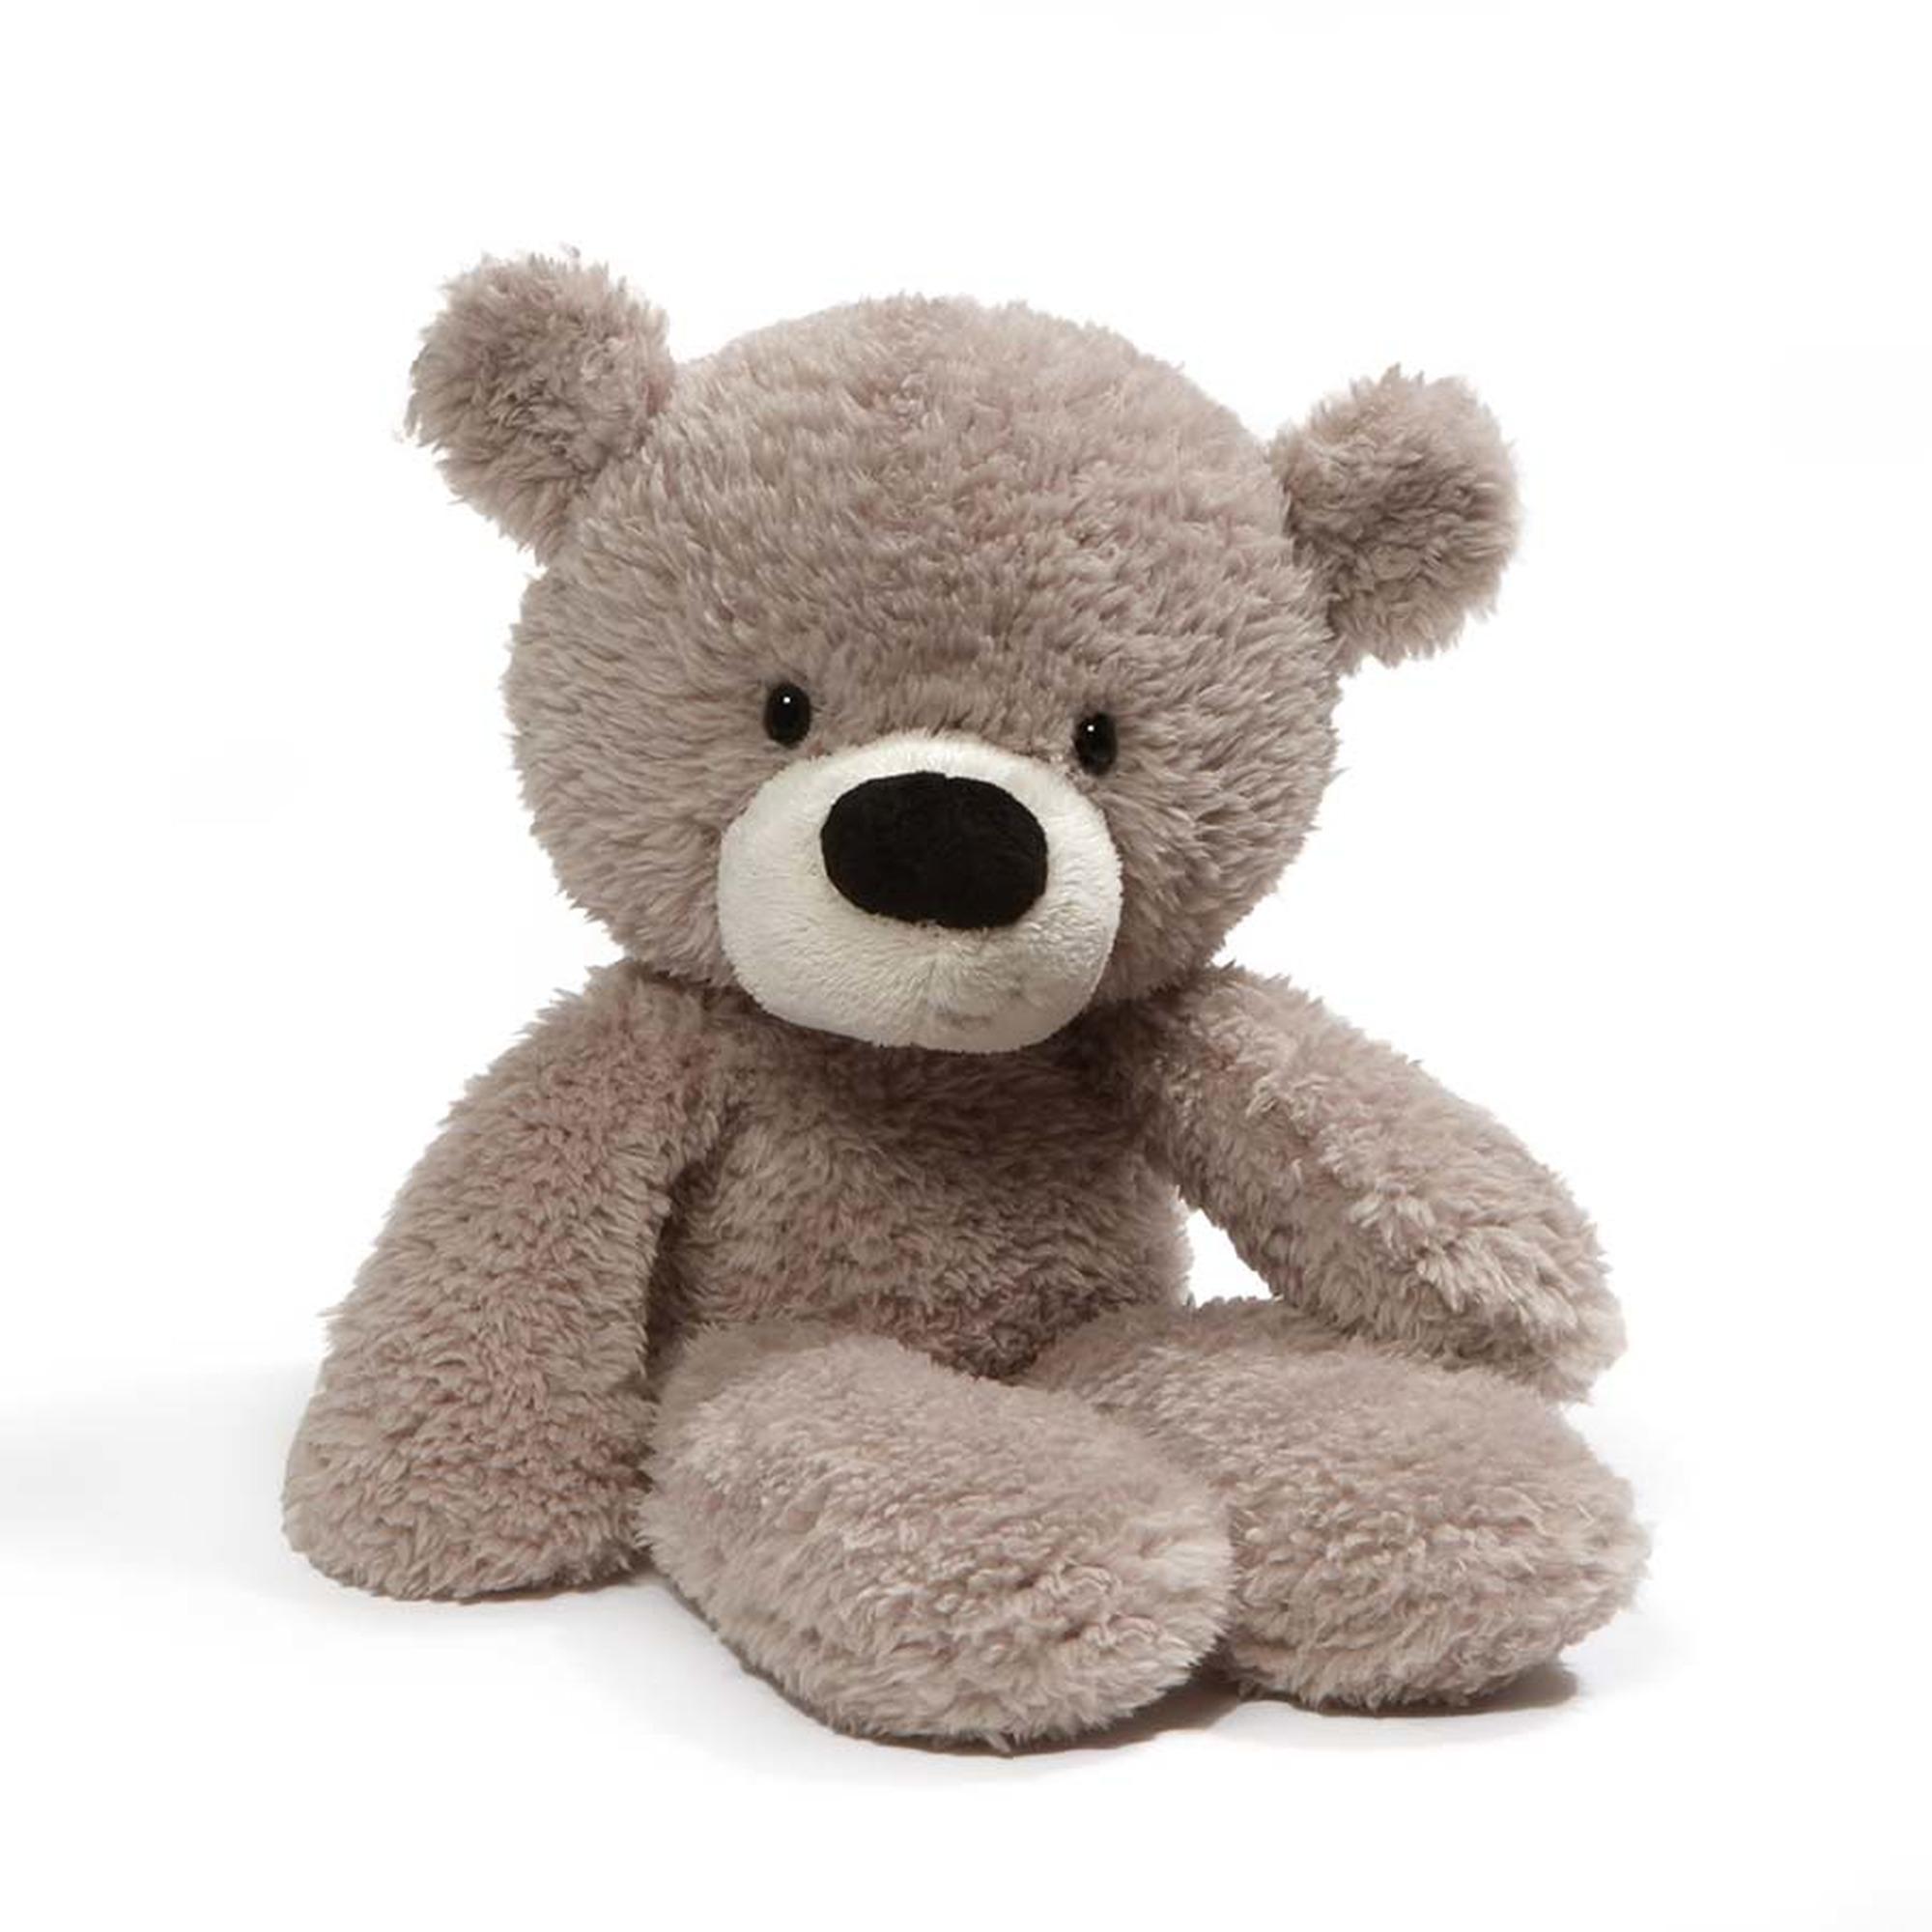 c1dc20a6907f Gund Fuzzy Teddy Bear Gray 13.5 Inches   Soft Toys Singapore